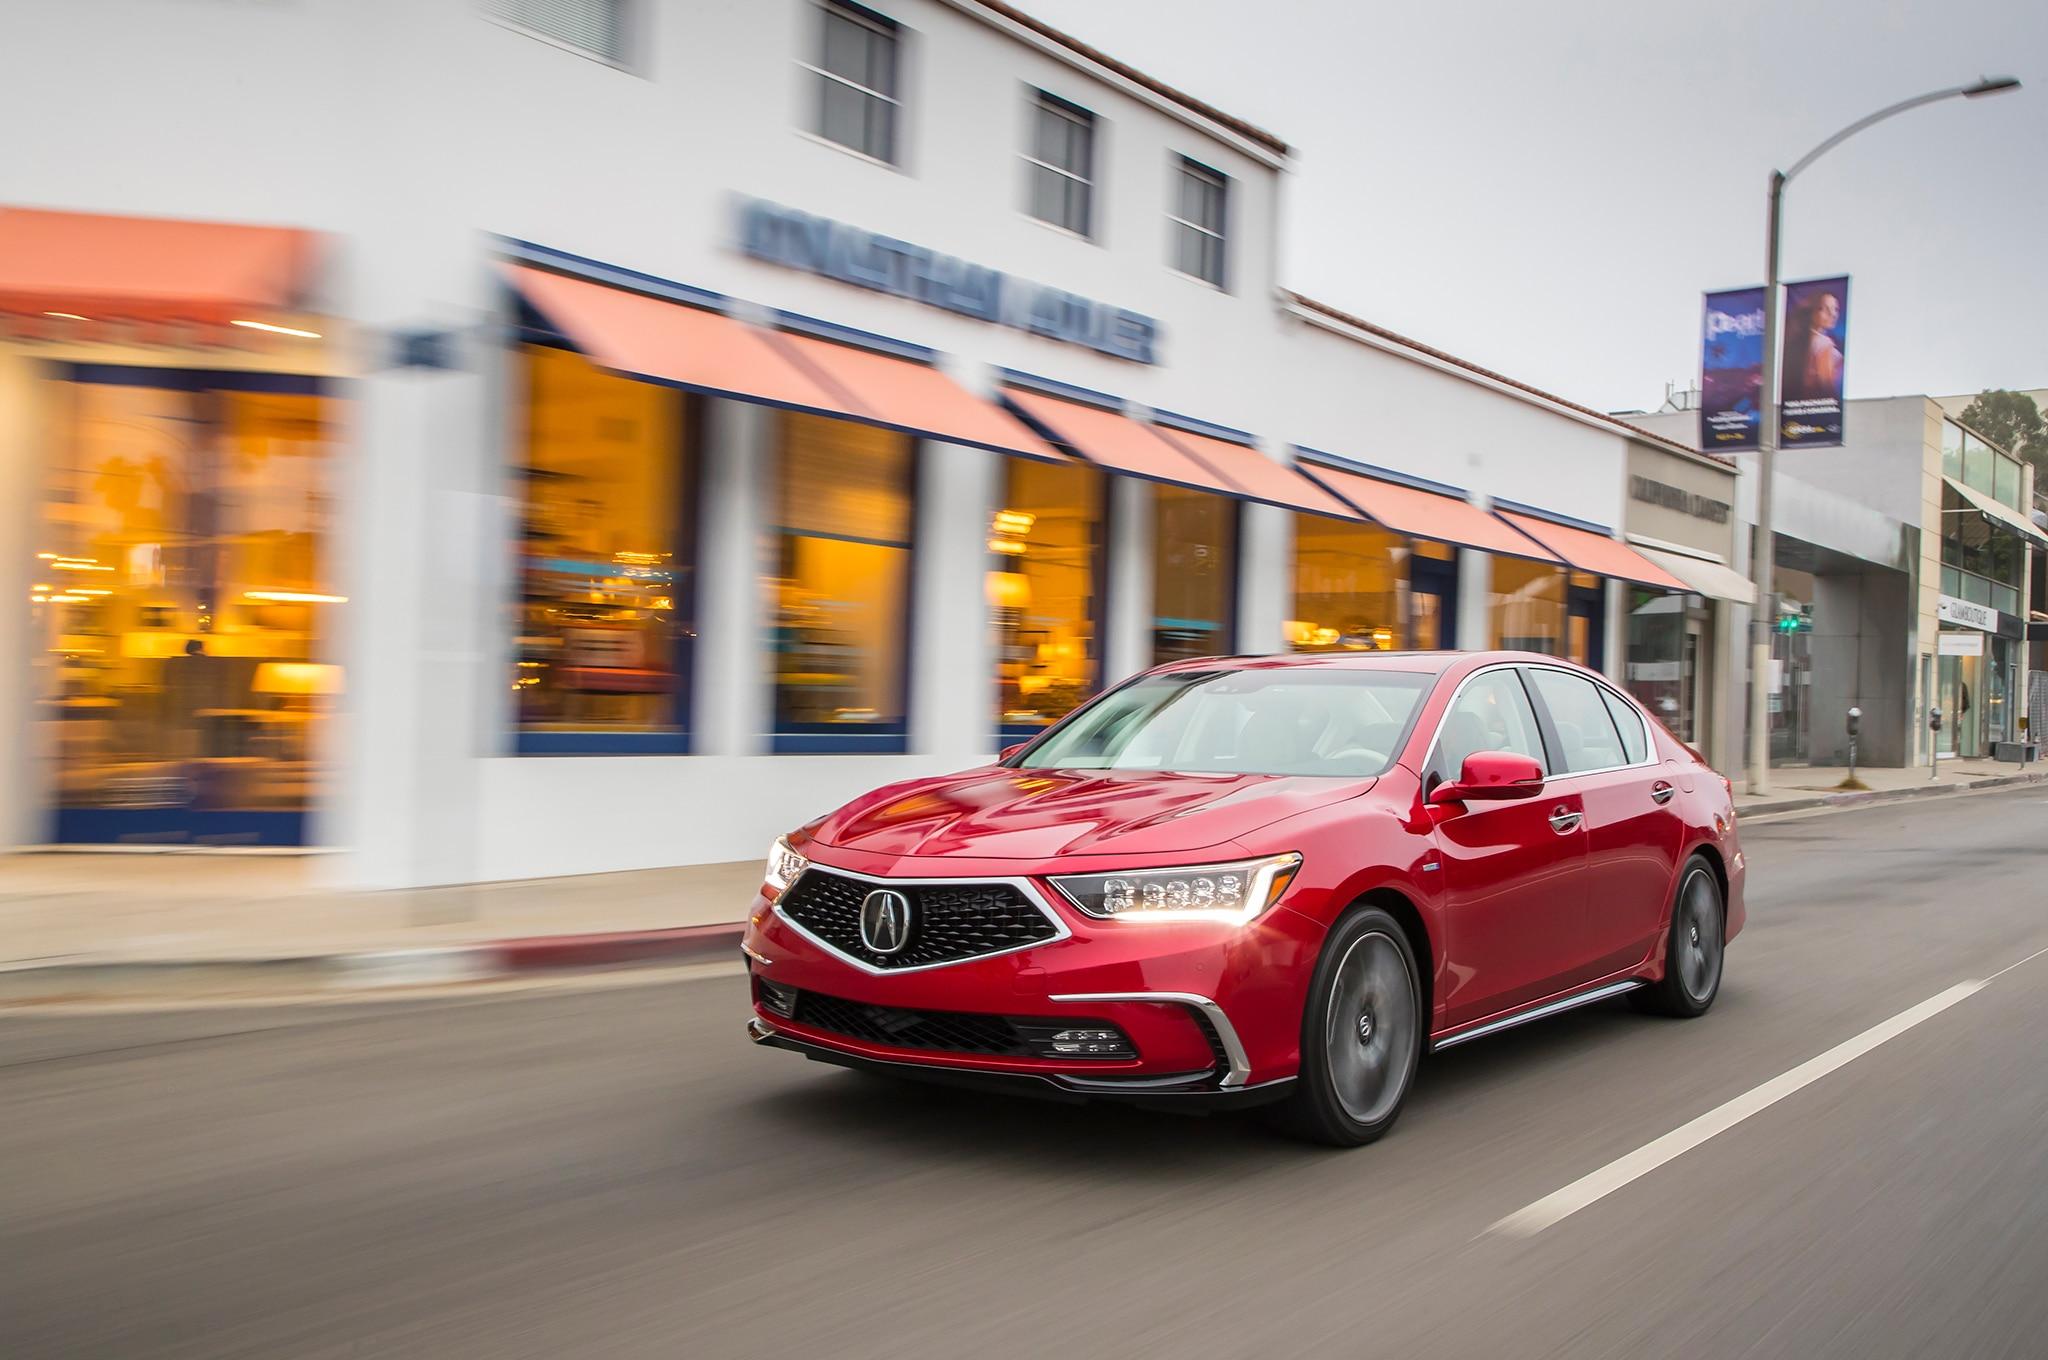 2018 Acura RLX Sport Hybrid Front Three Quarter In Motion 04